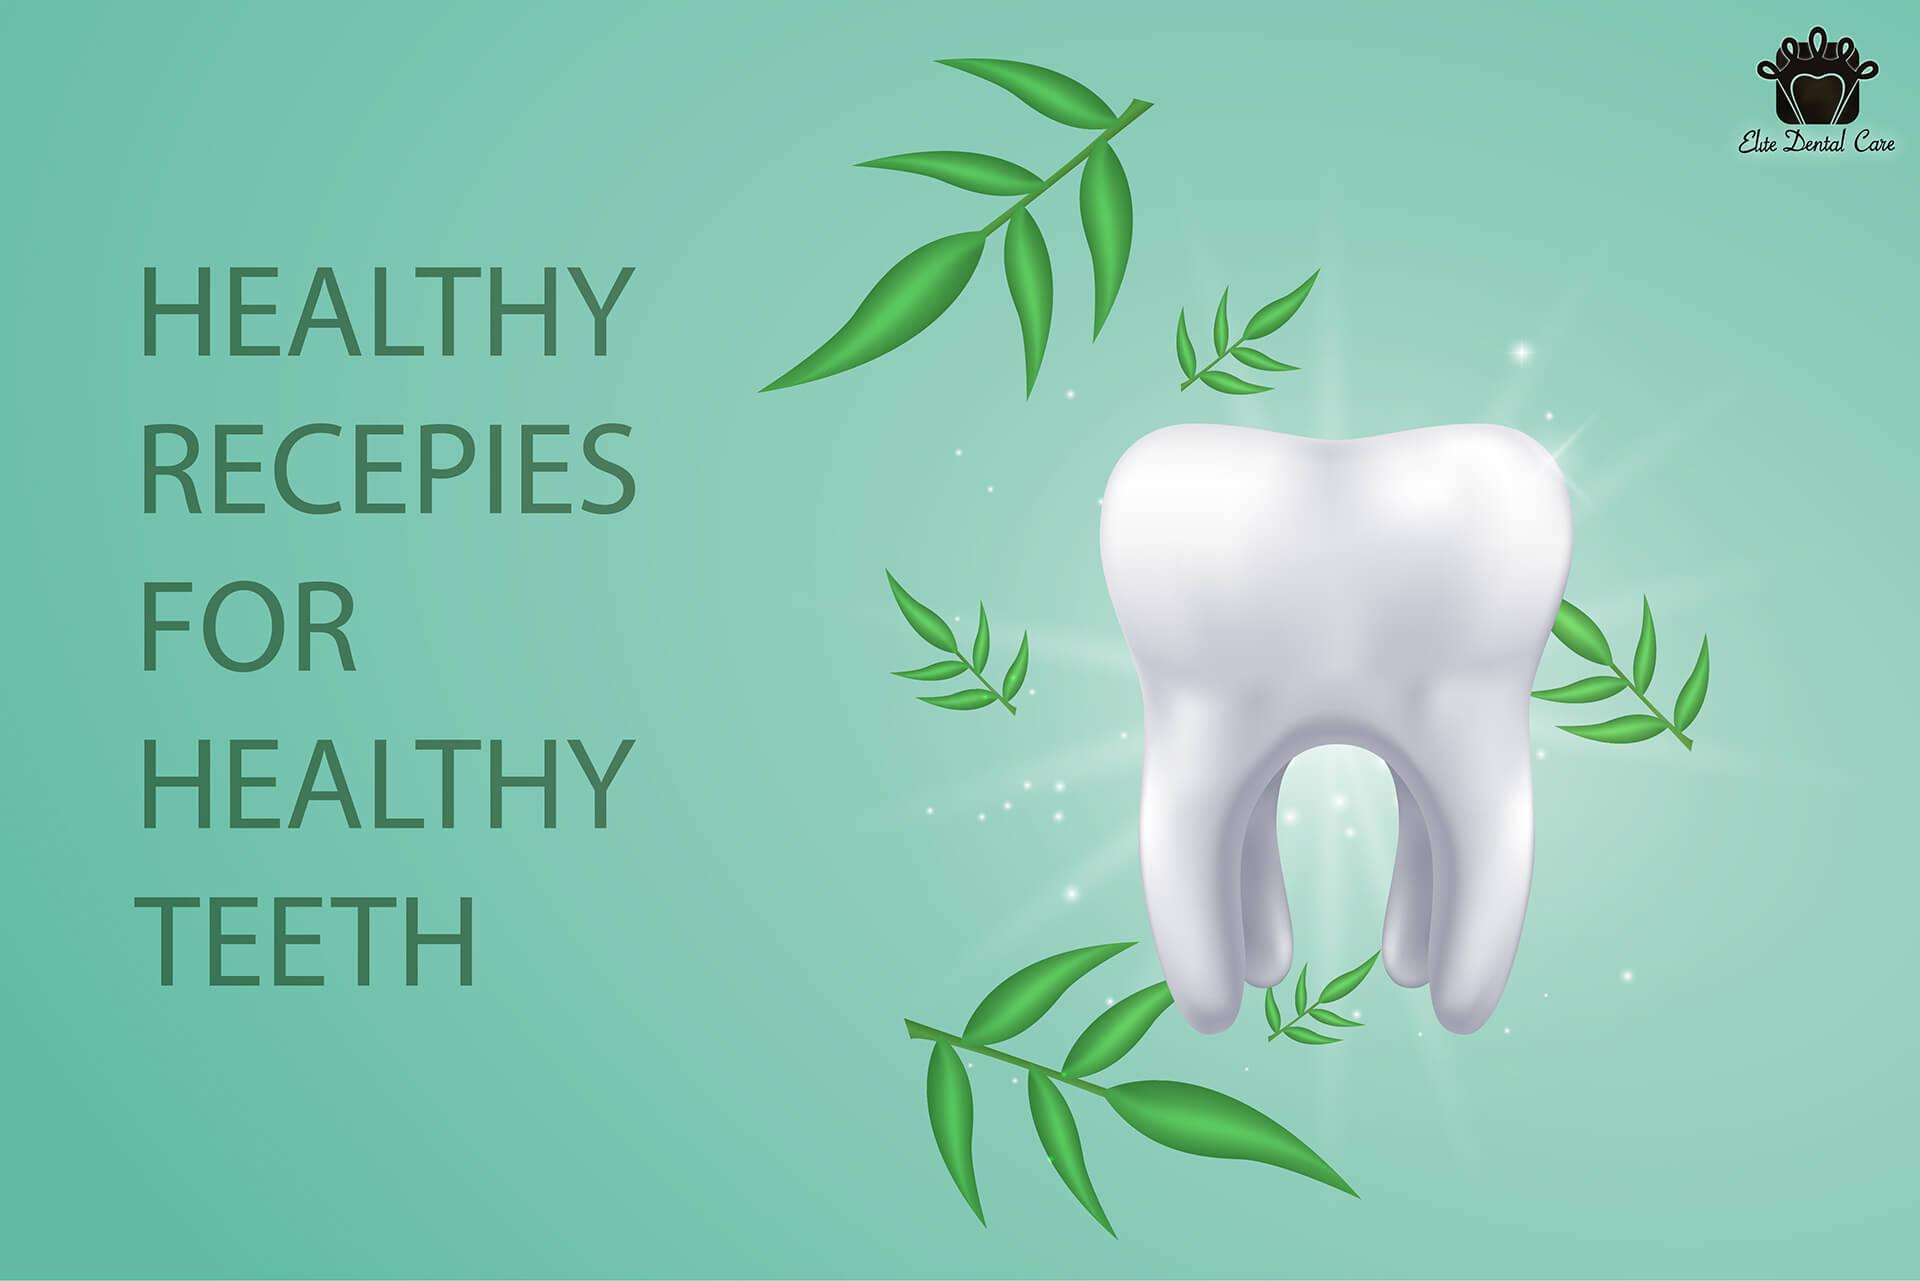 Healthy Recipes for Healthy Teeth